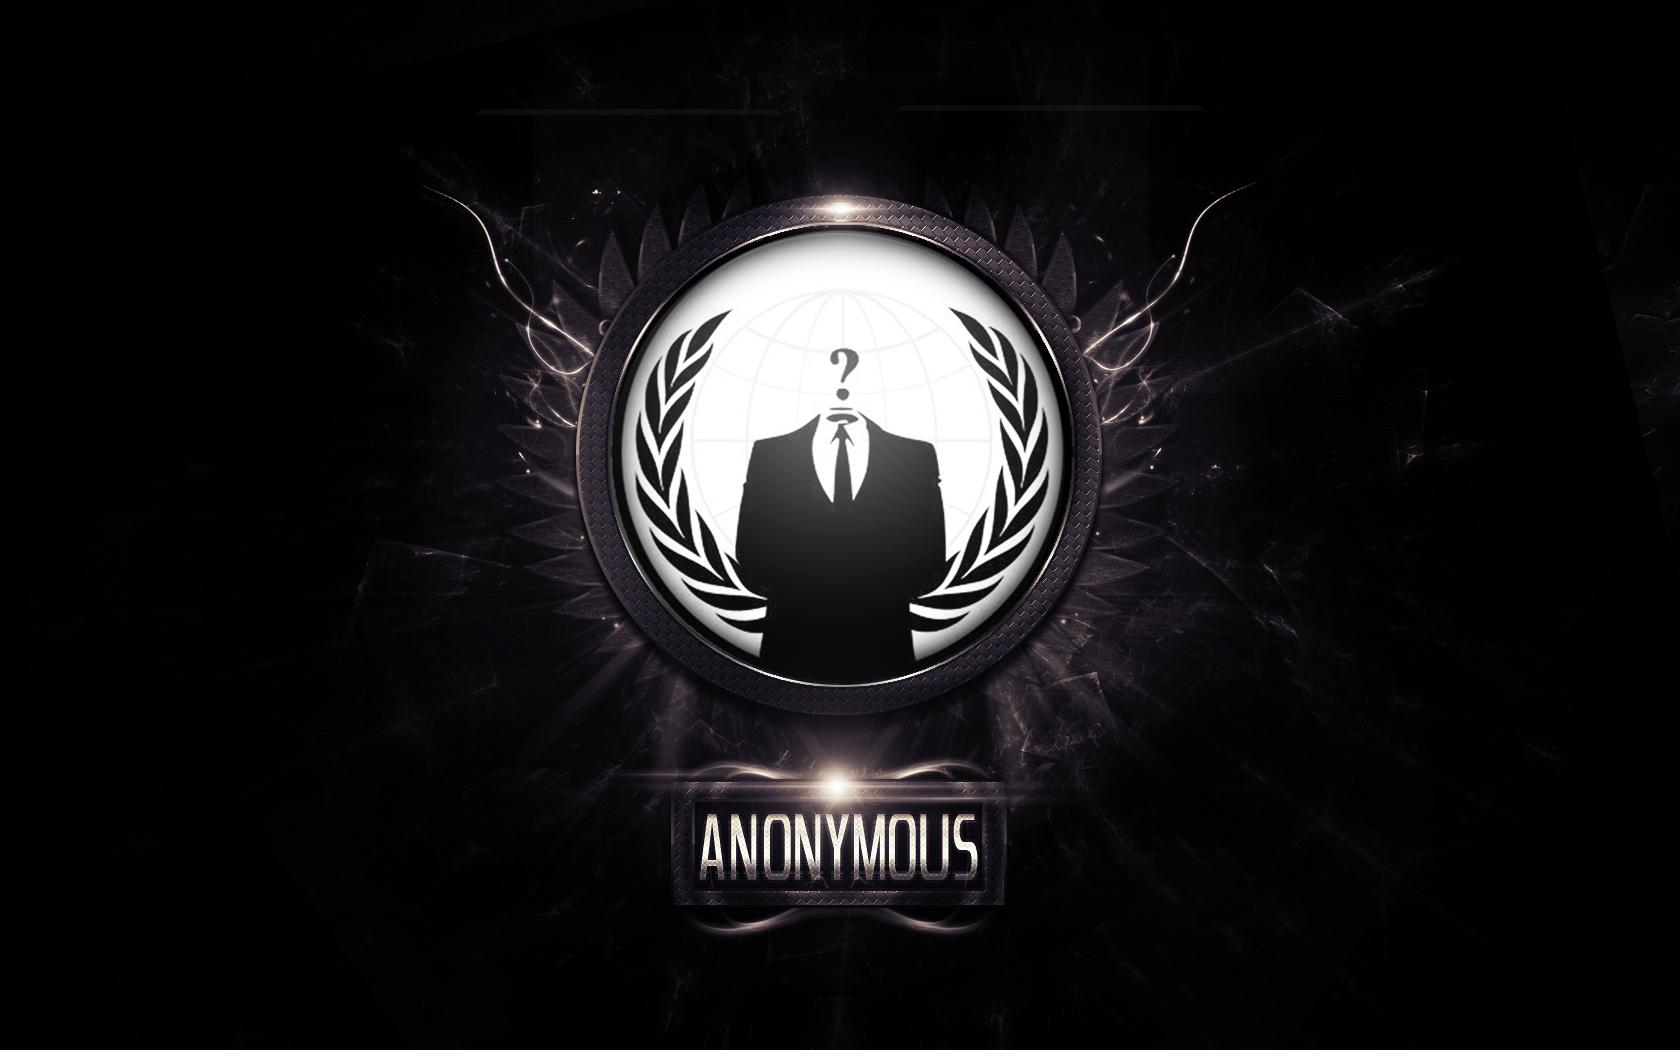 Anonymous HD Masaüstü Resimleri |Hd Wallpapers